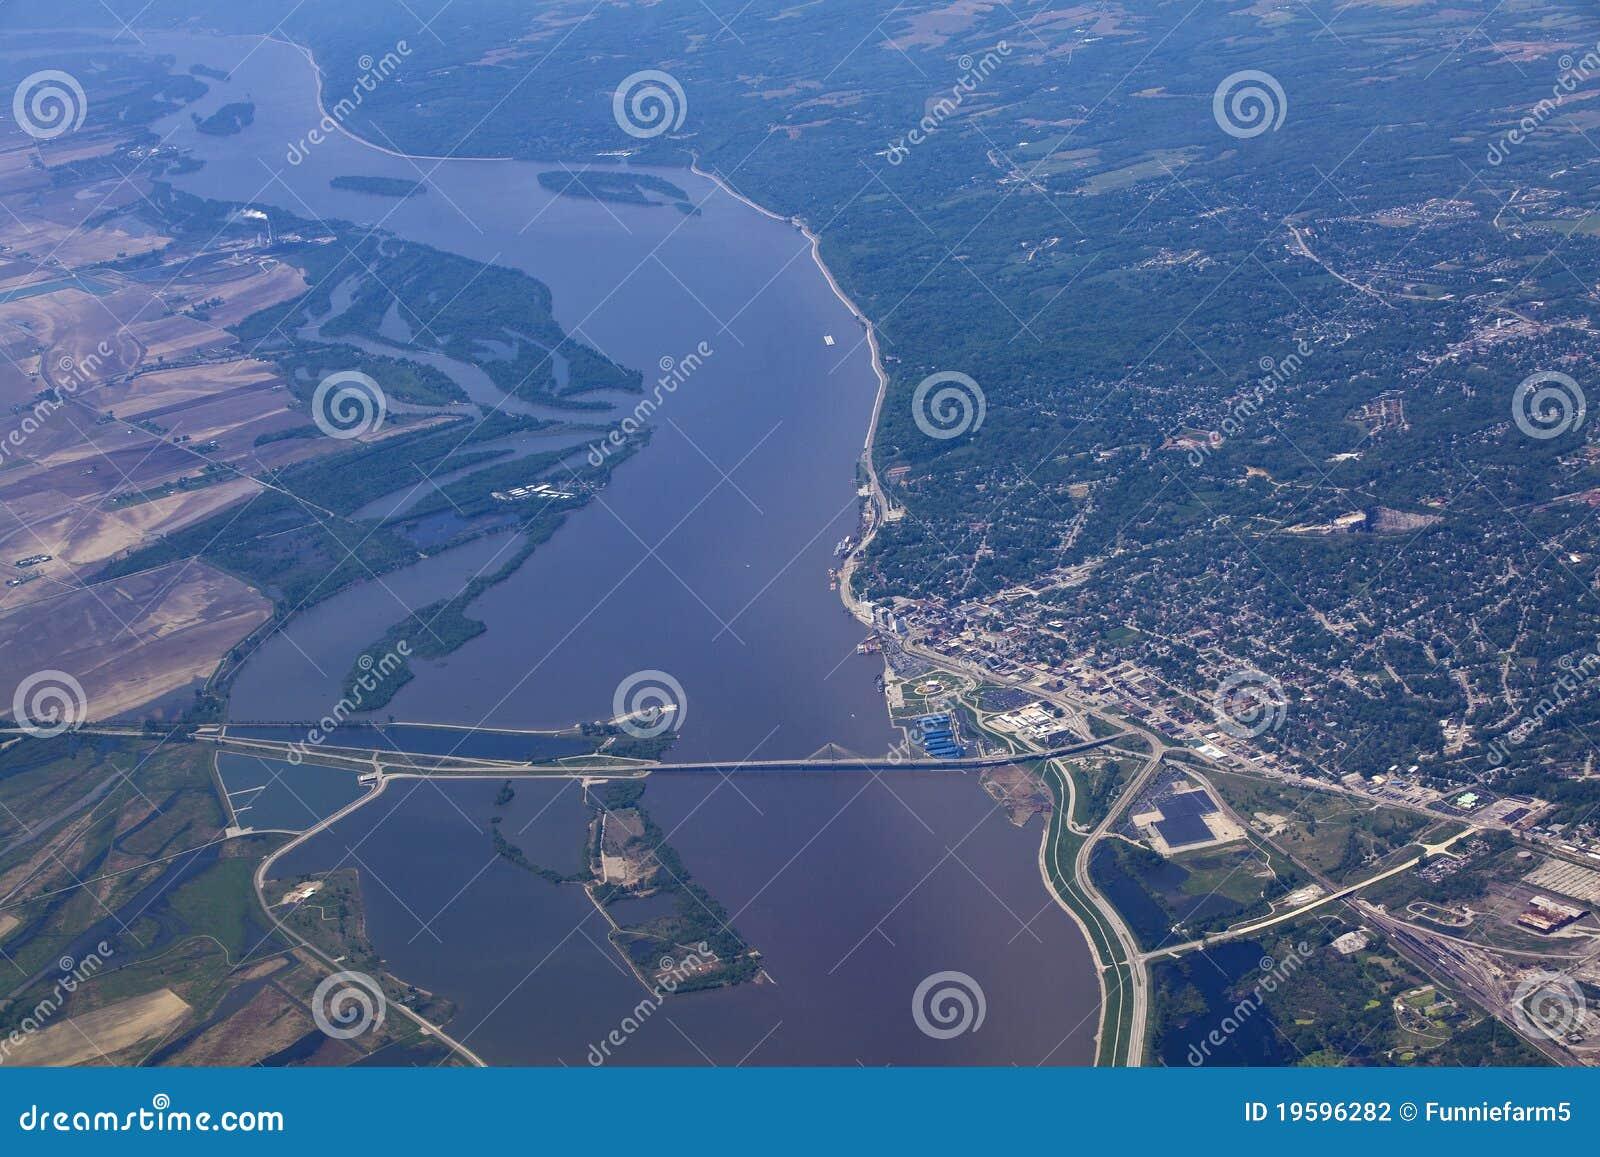 Aerial View Of Alton Illinois And The Clark Bridge Stock